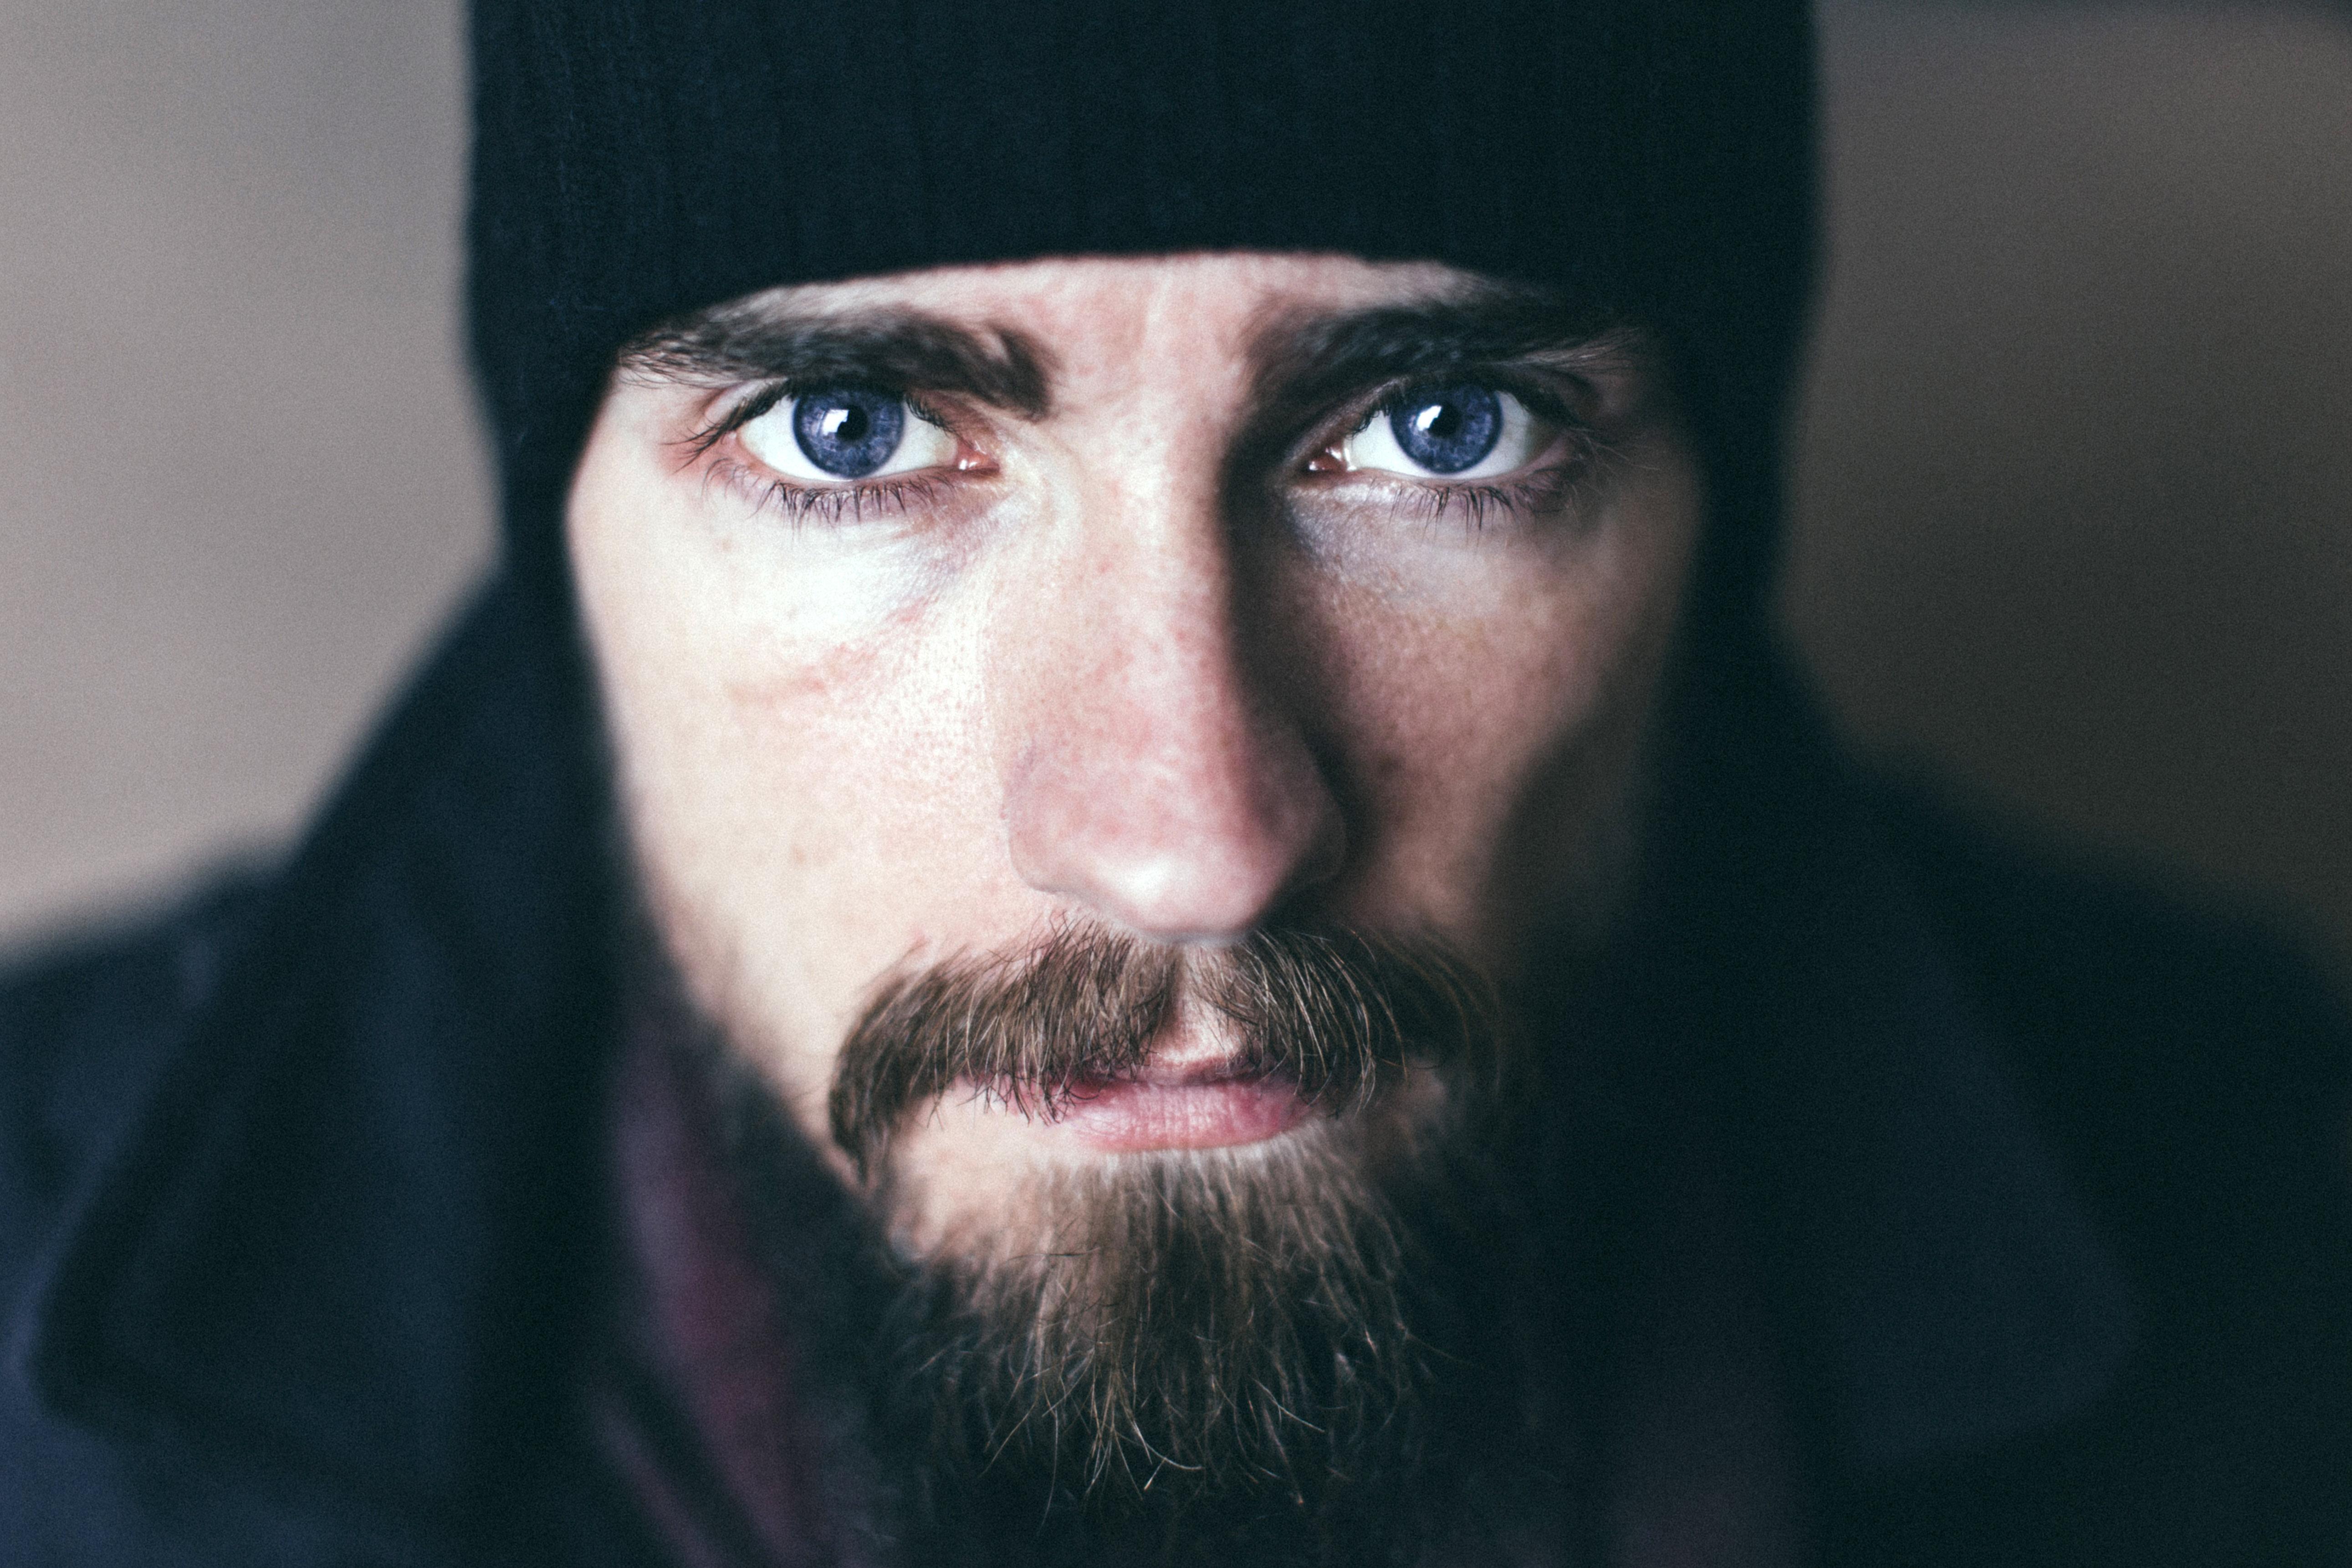 face of a bearded man image free stock photo public domain photo